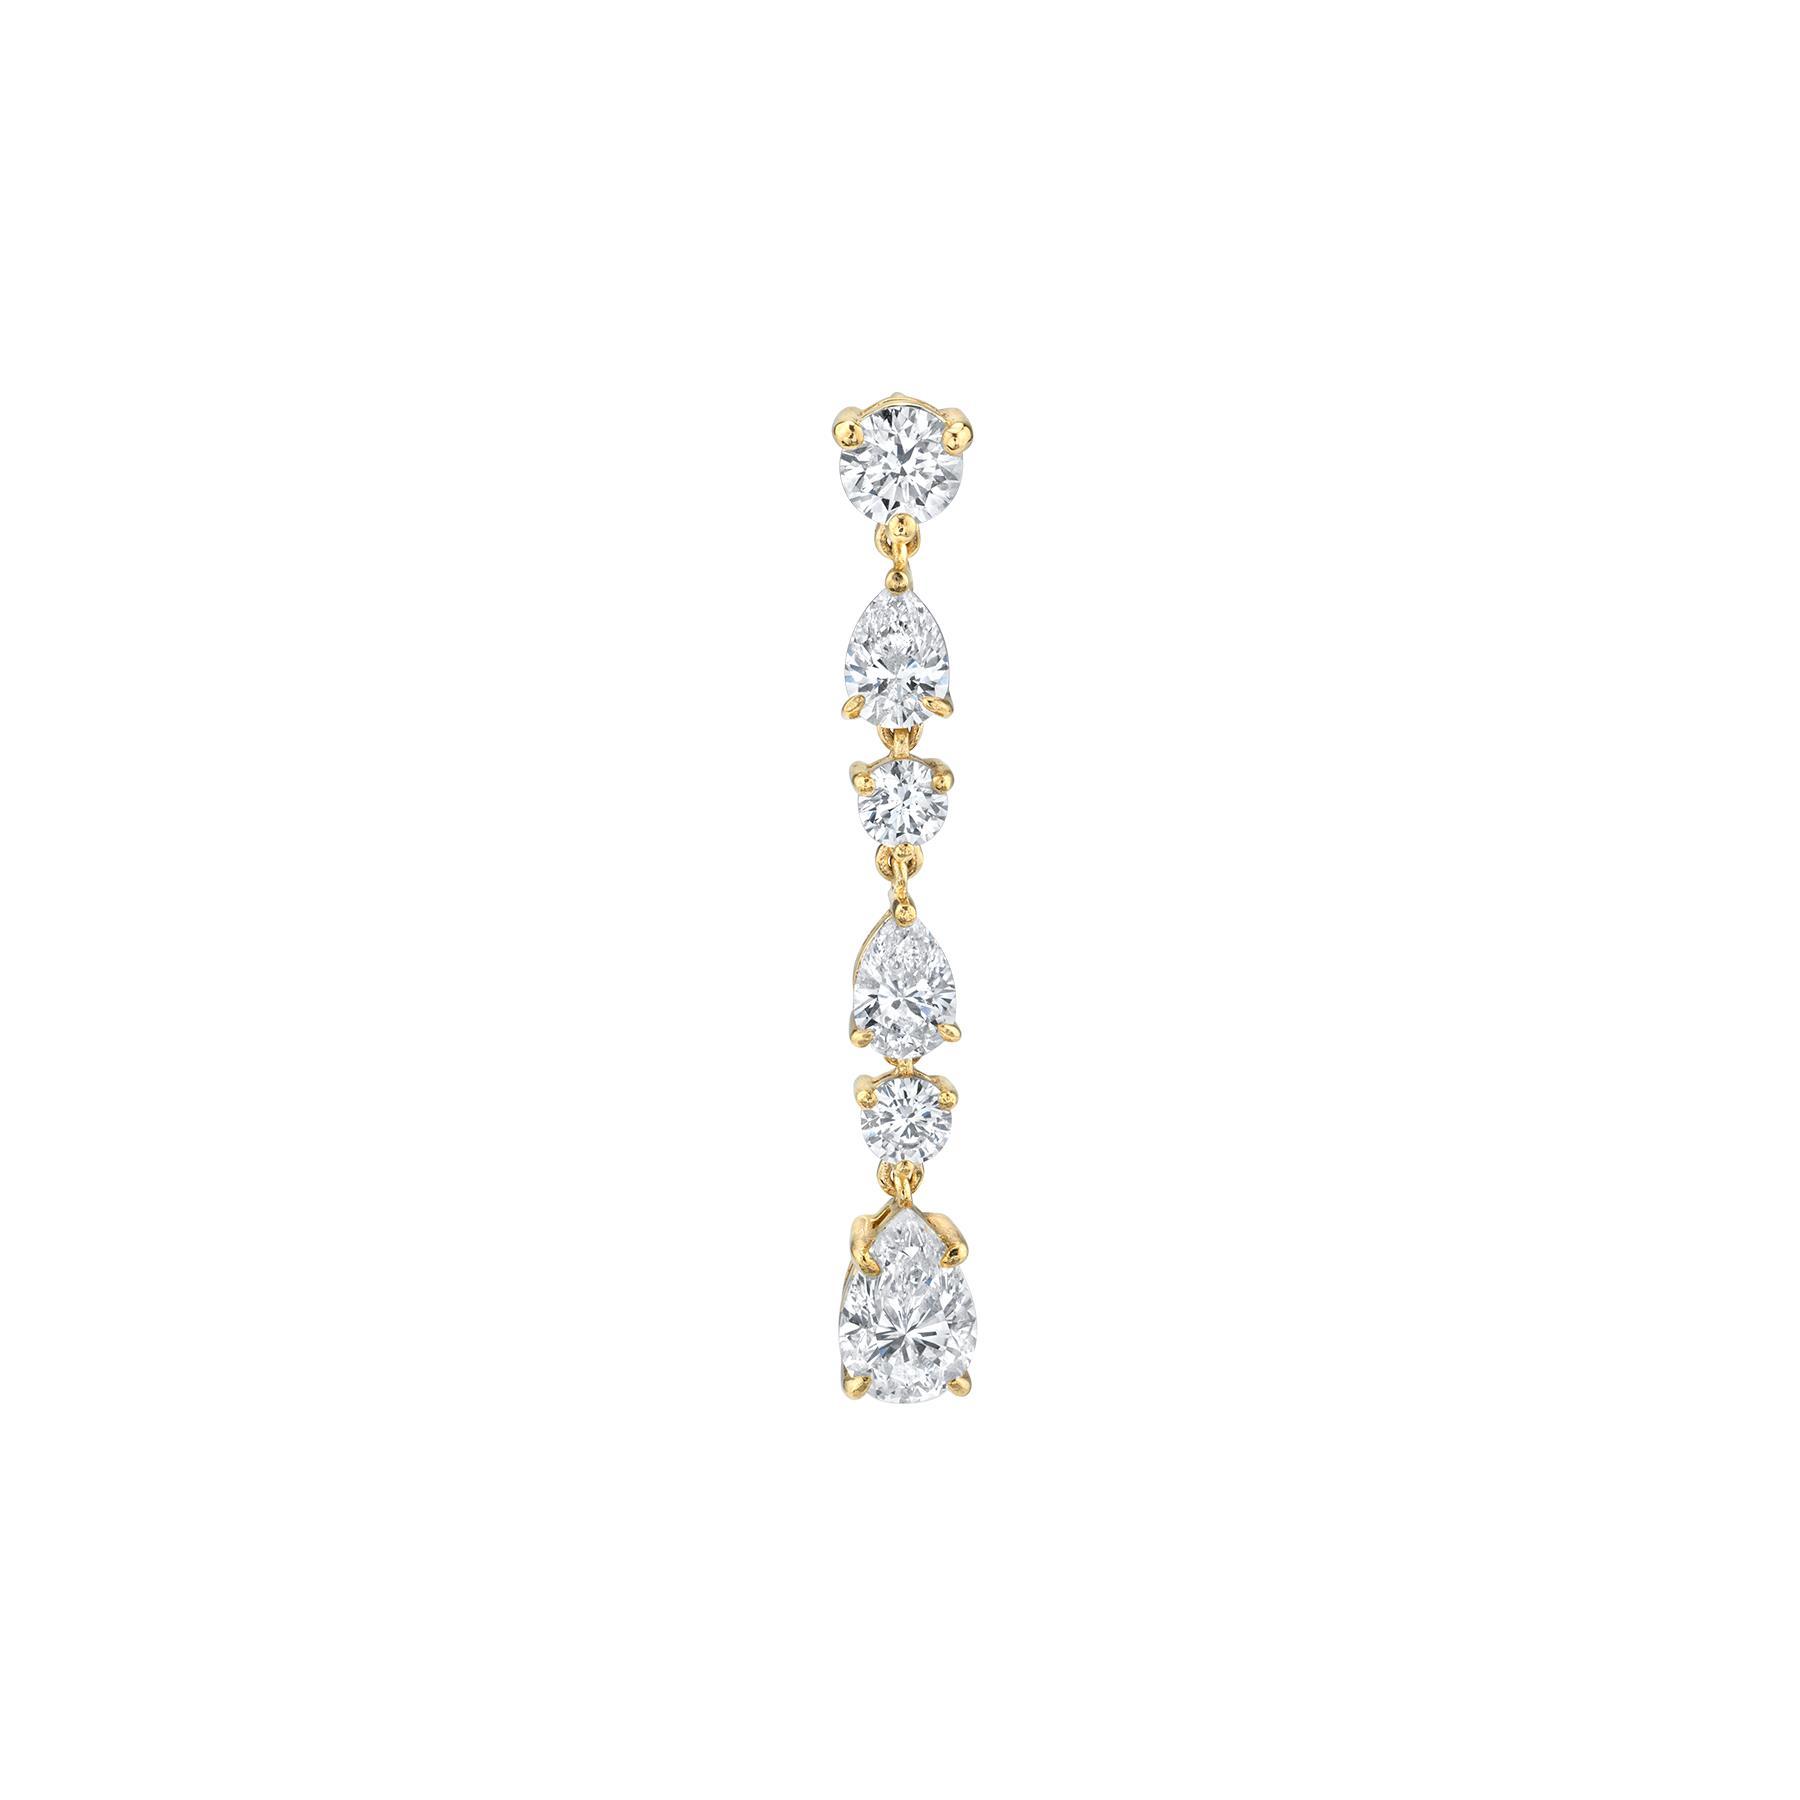 DIAMOND PEAR DROP CHAIN EARRING